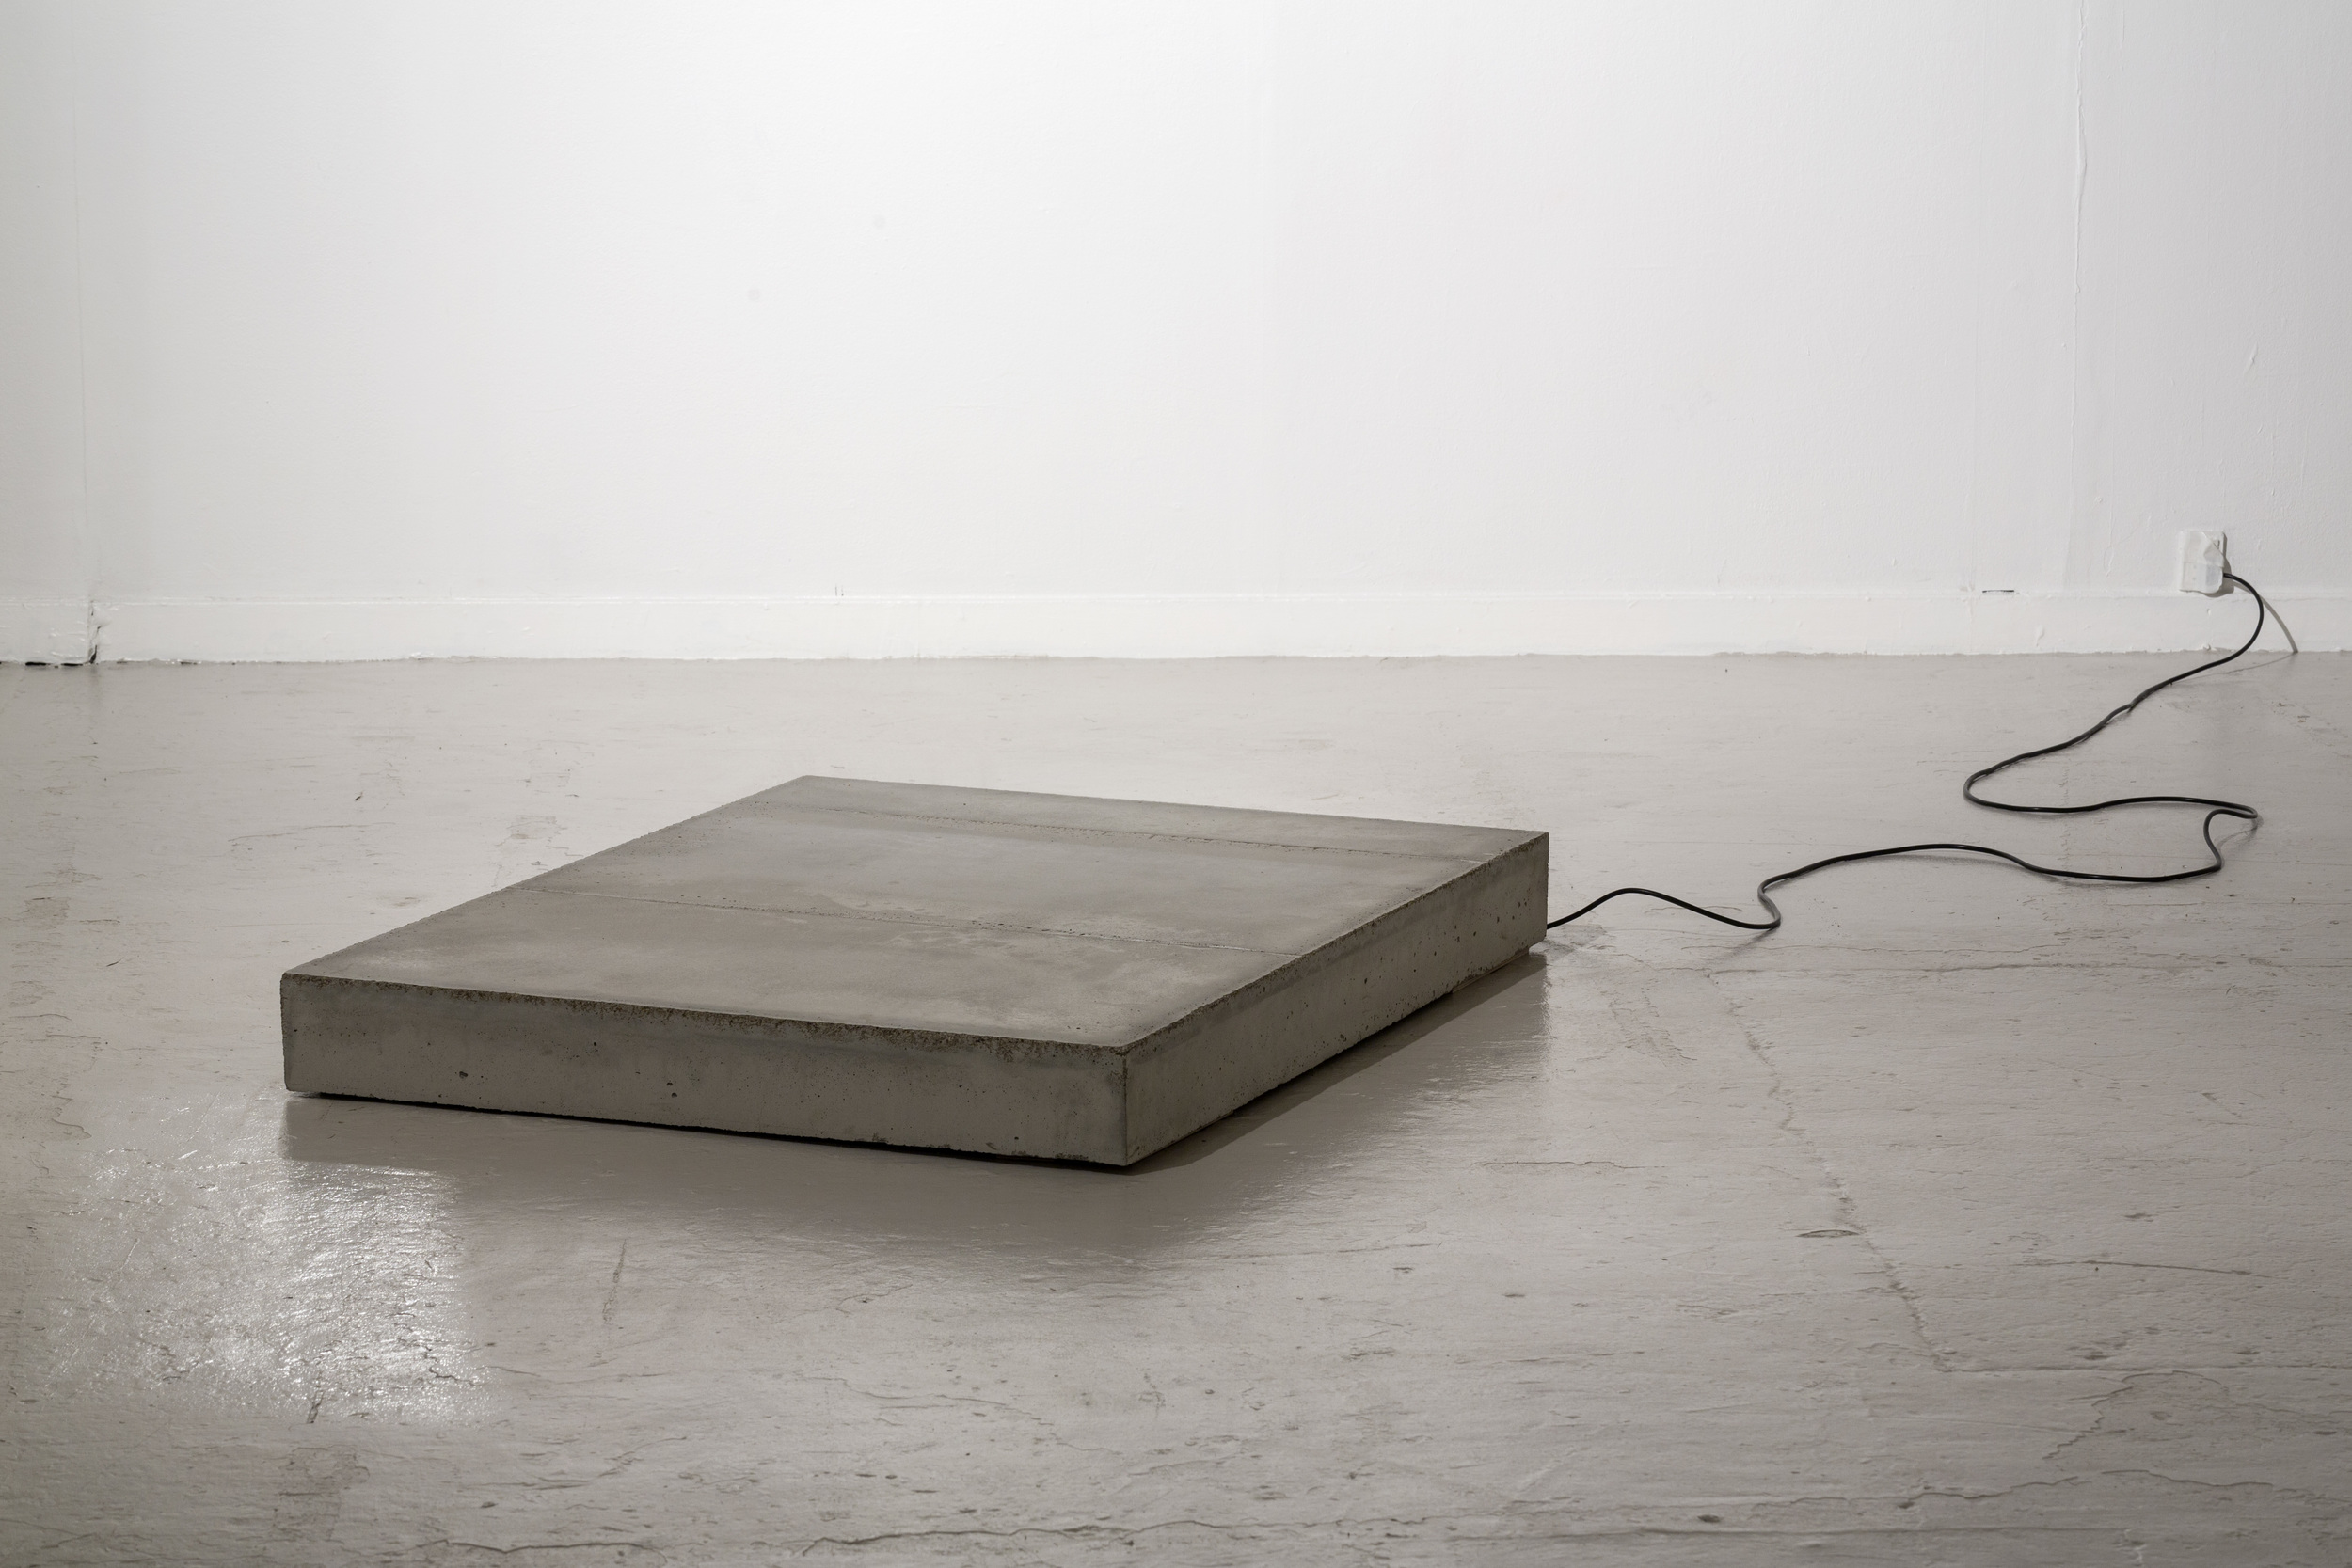 SELF-PORTRAIT, NAKED #11 Dimension: H: 13 cm W: 133 cm L: 100 cm Materials: Concrete, heating element, reinforcing steel.